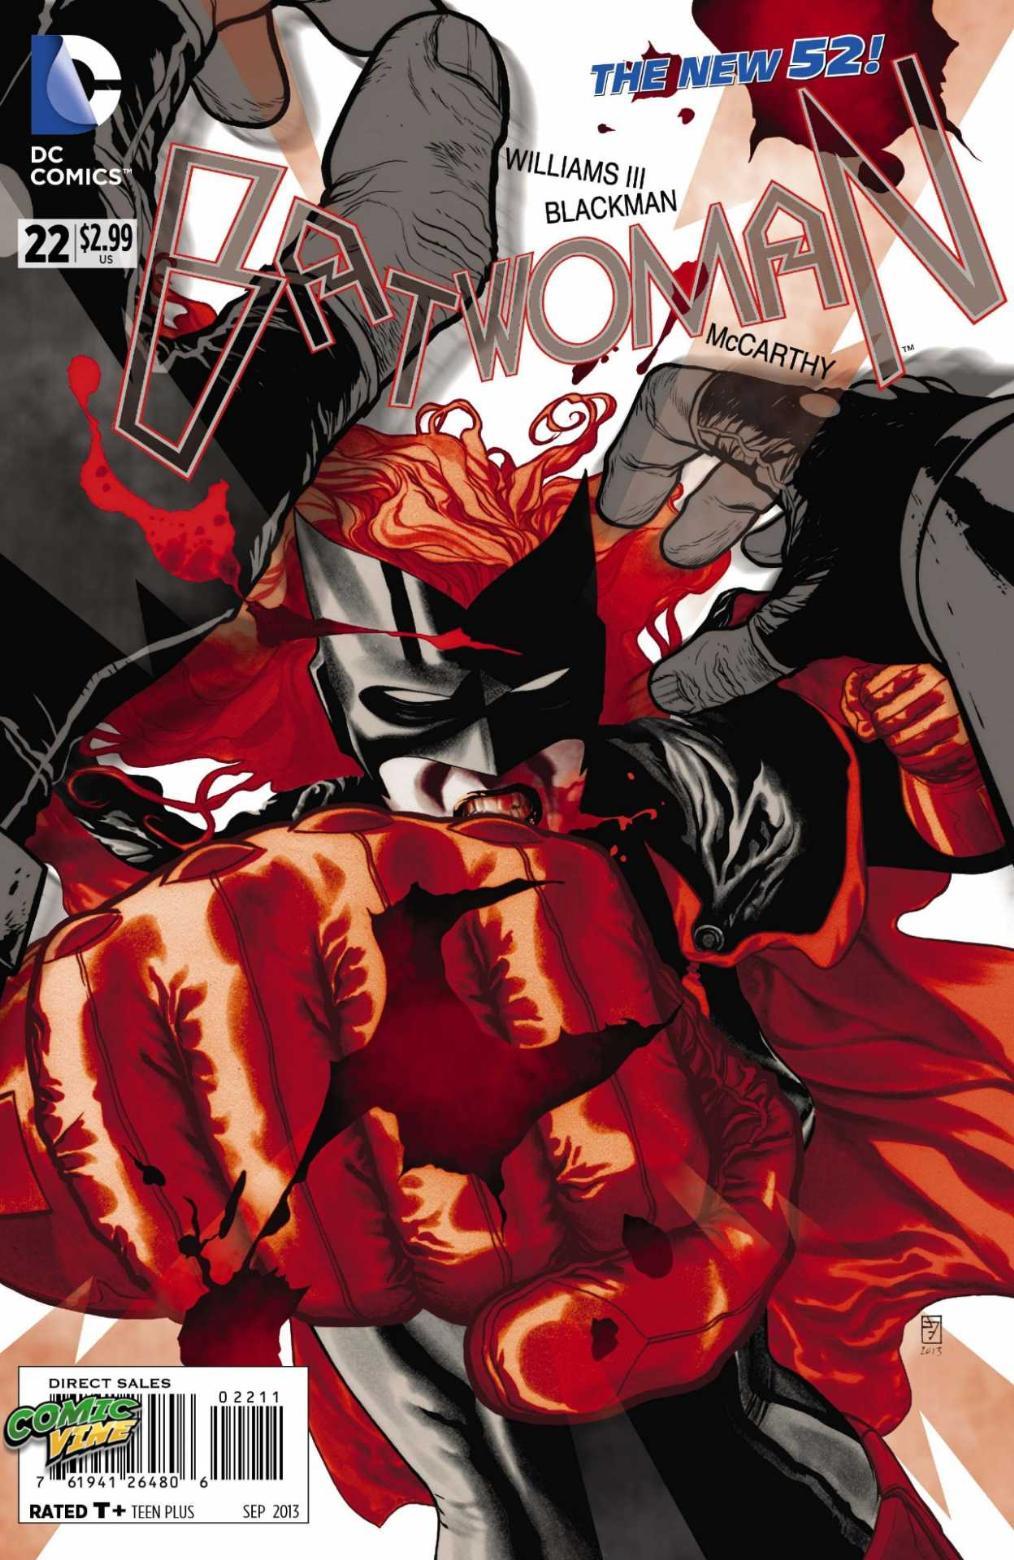 Batwoman new 52 #22 capa